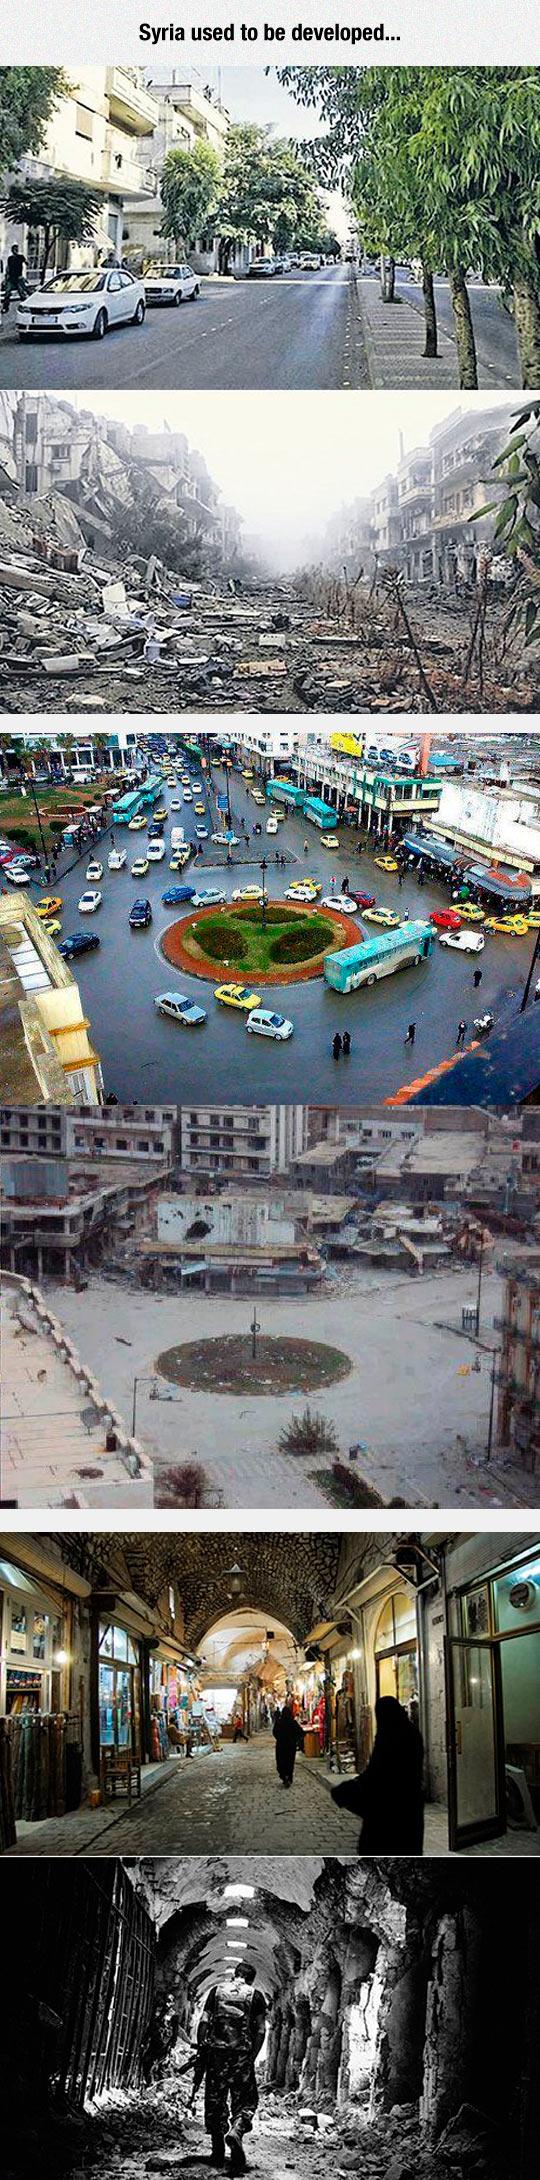 funny-Syria-city-street-war-destroyed